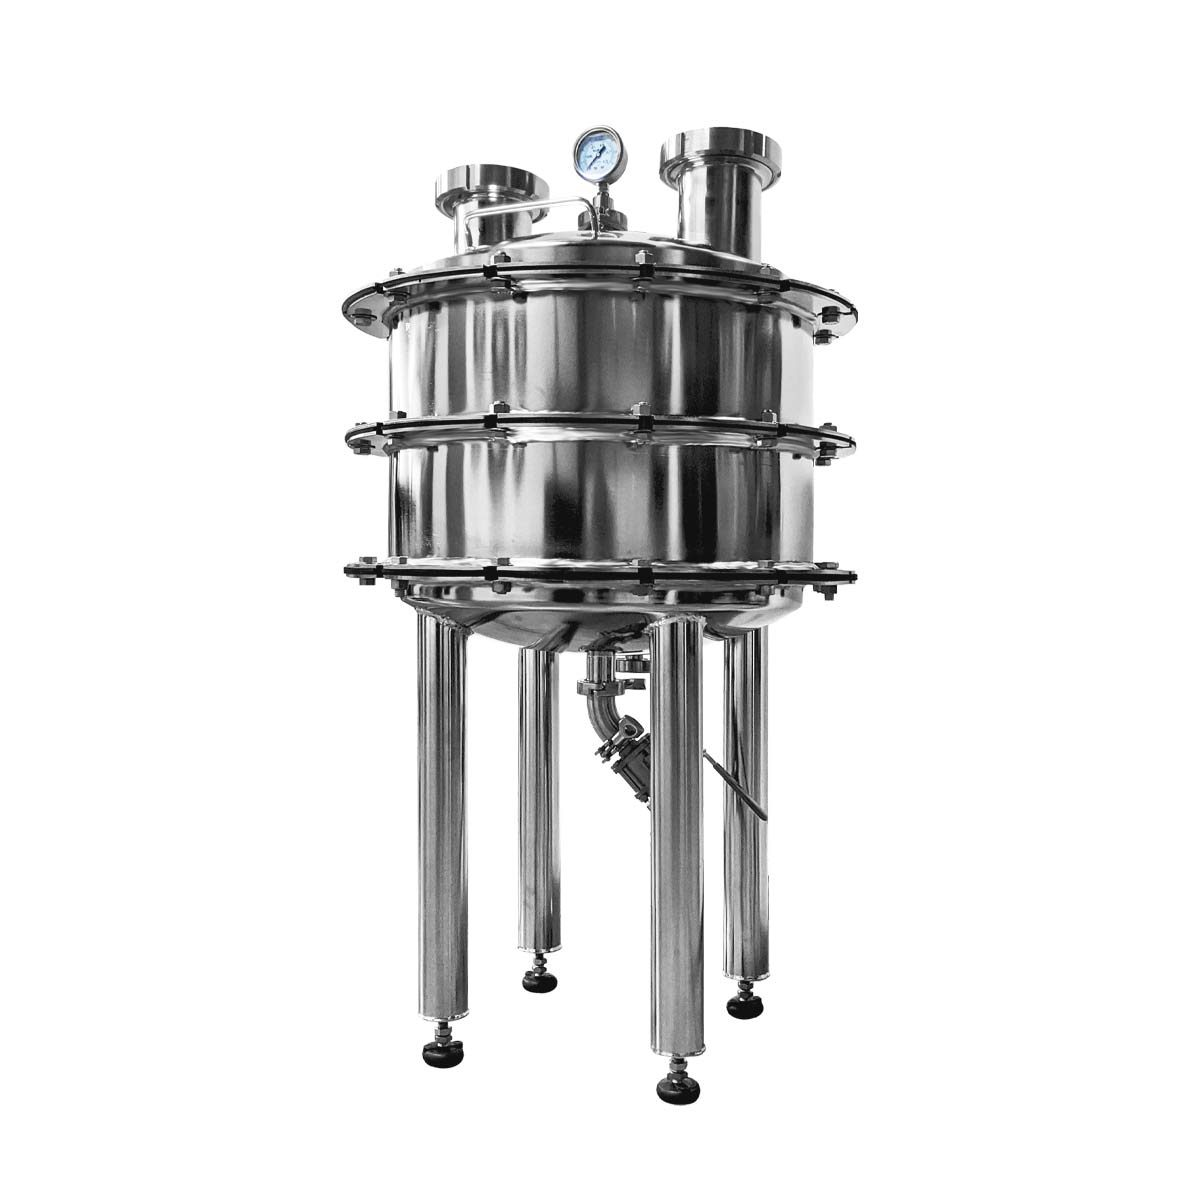 Aptia Dynamic Wafer Filter - Double Basket